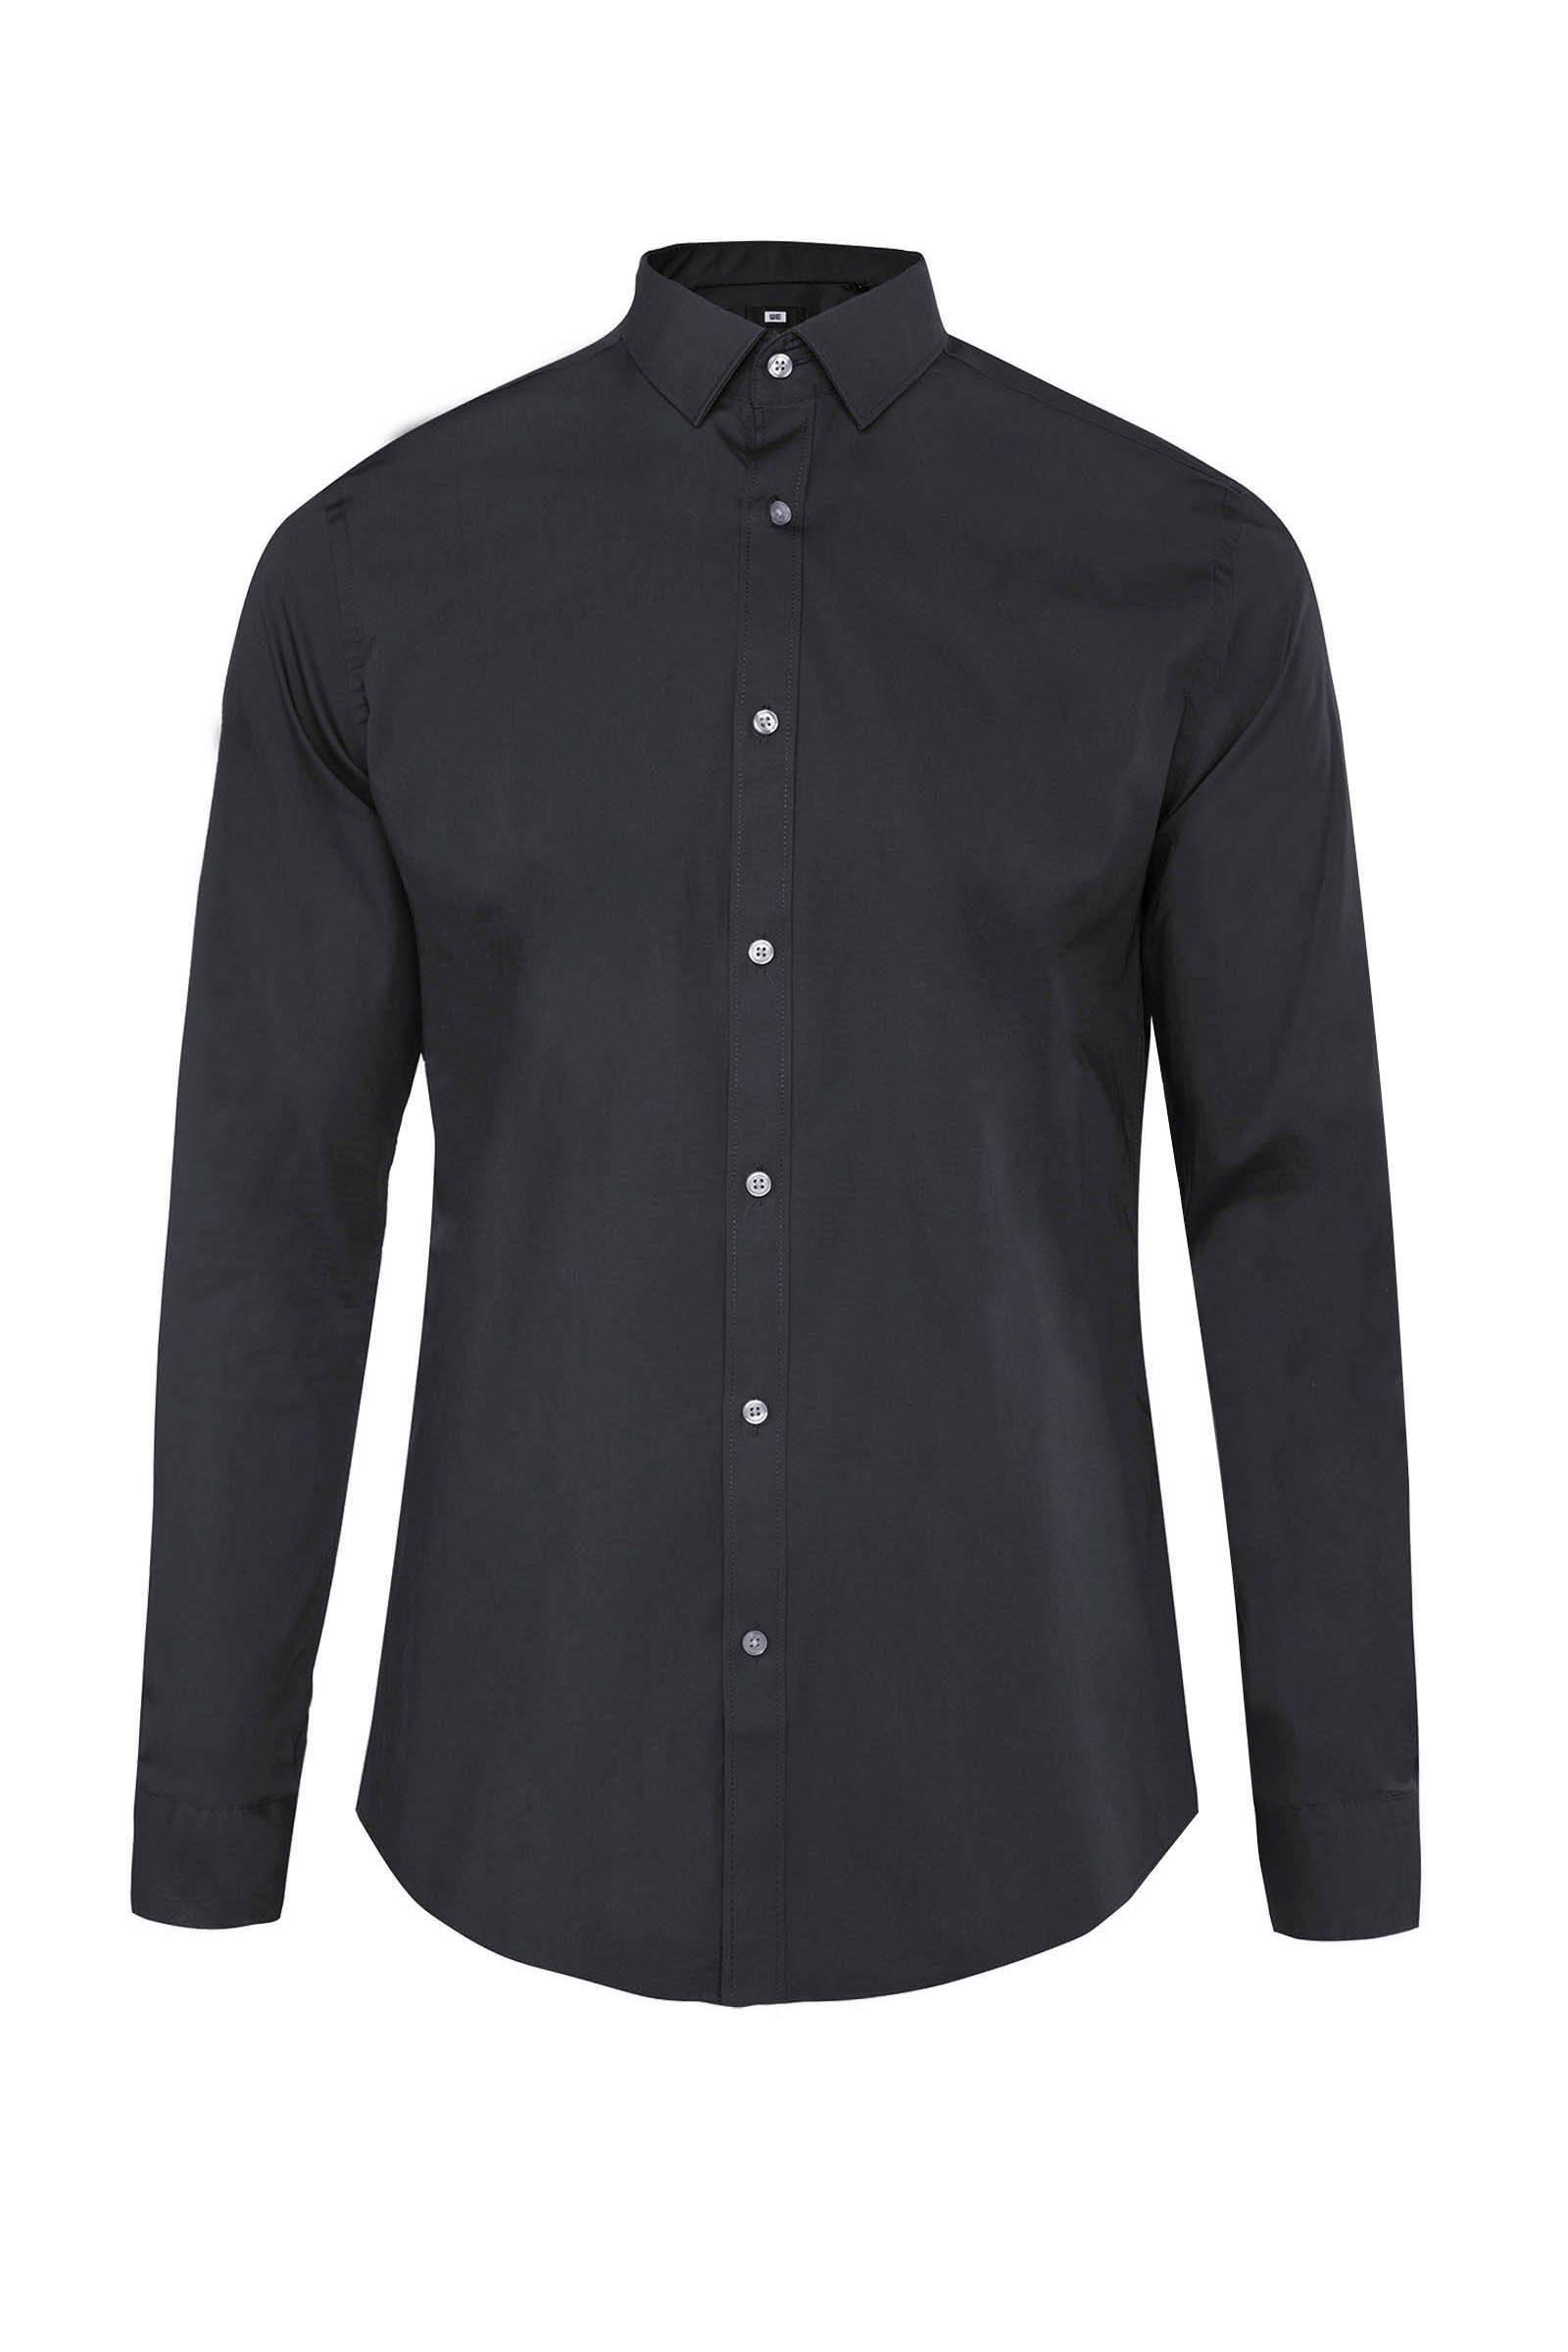 Zwart Overhemd We.We Fashion Slim Fit Overhemd Zwart Wehkamp